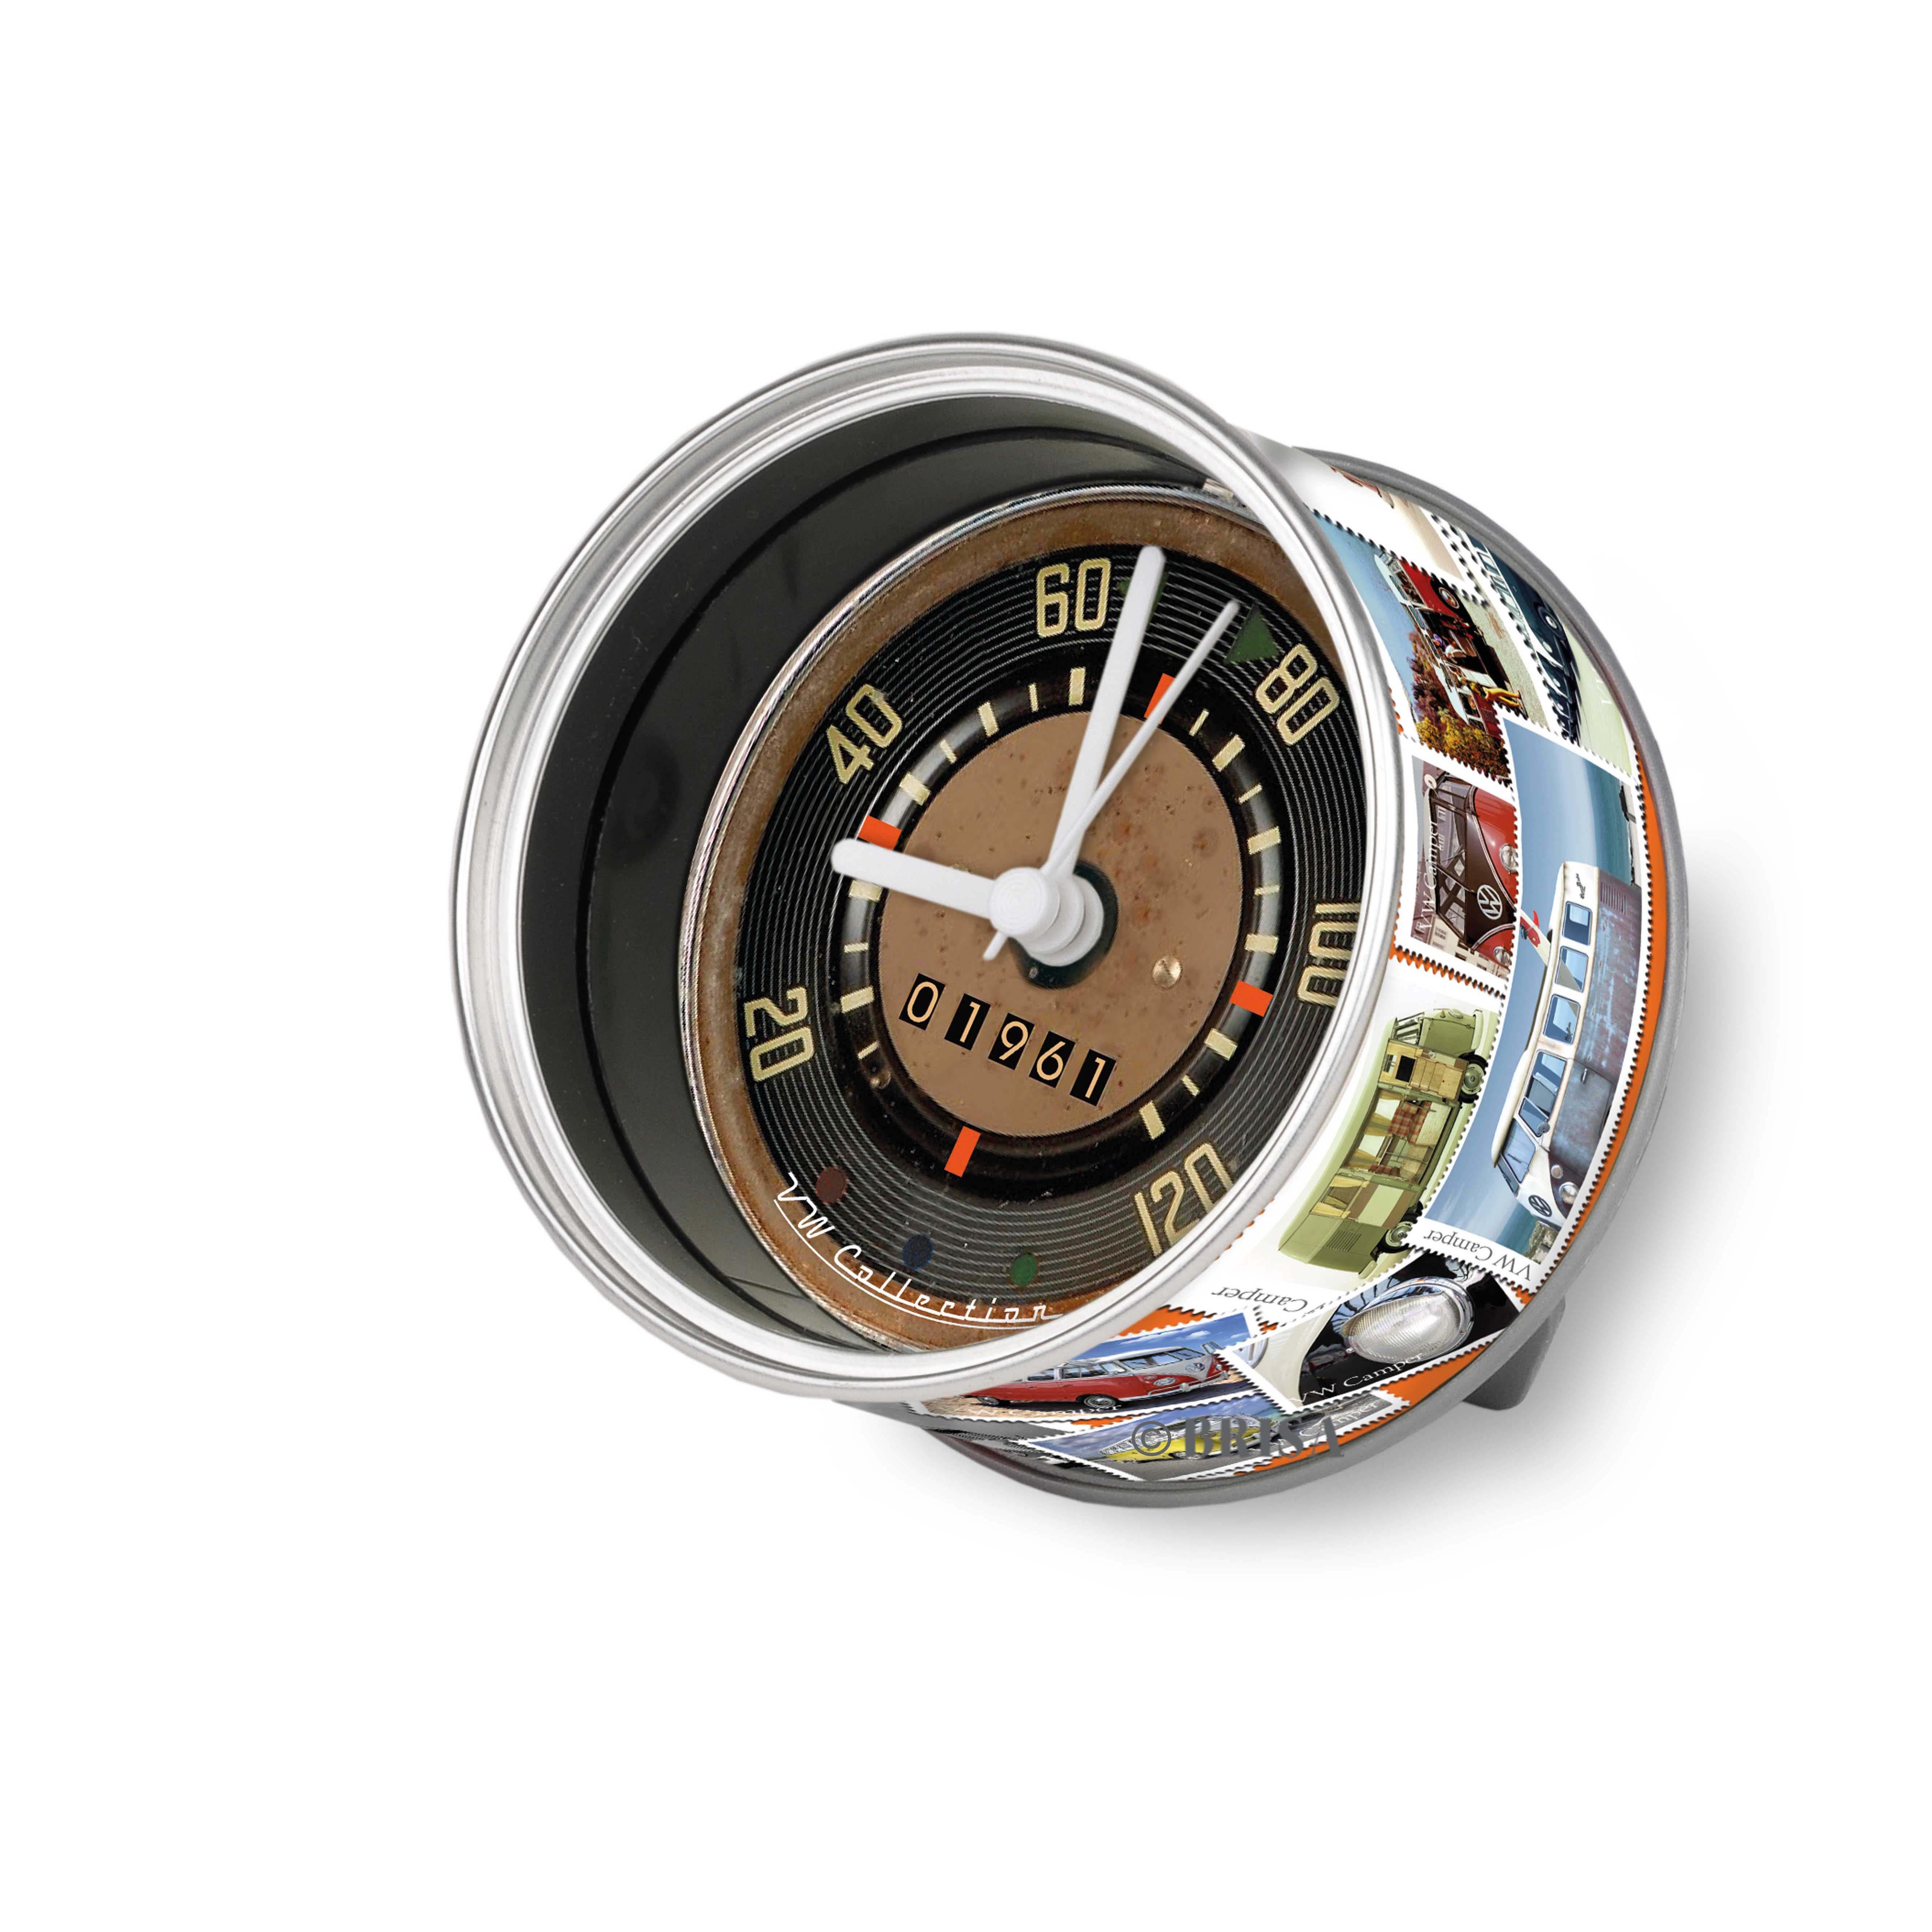 Uhren & Technik & Gadgets